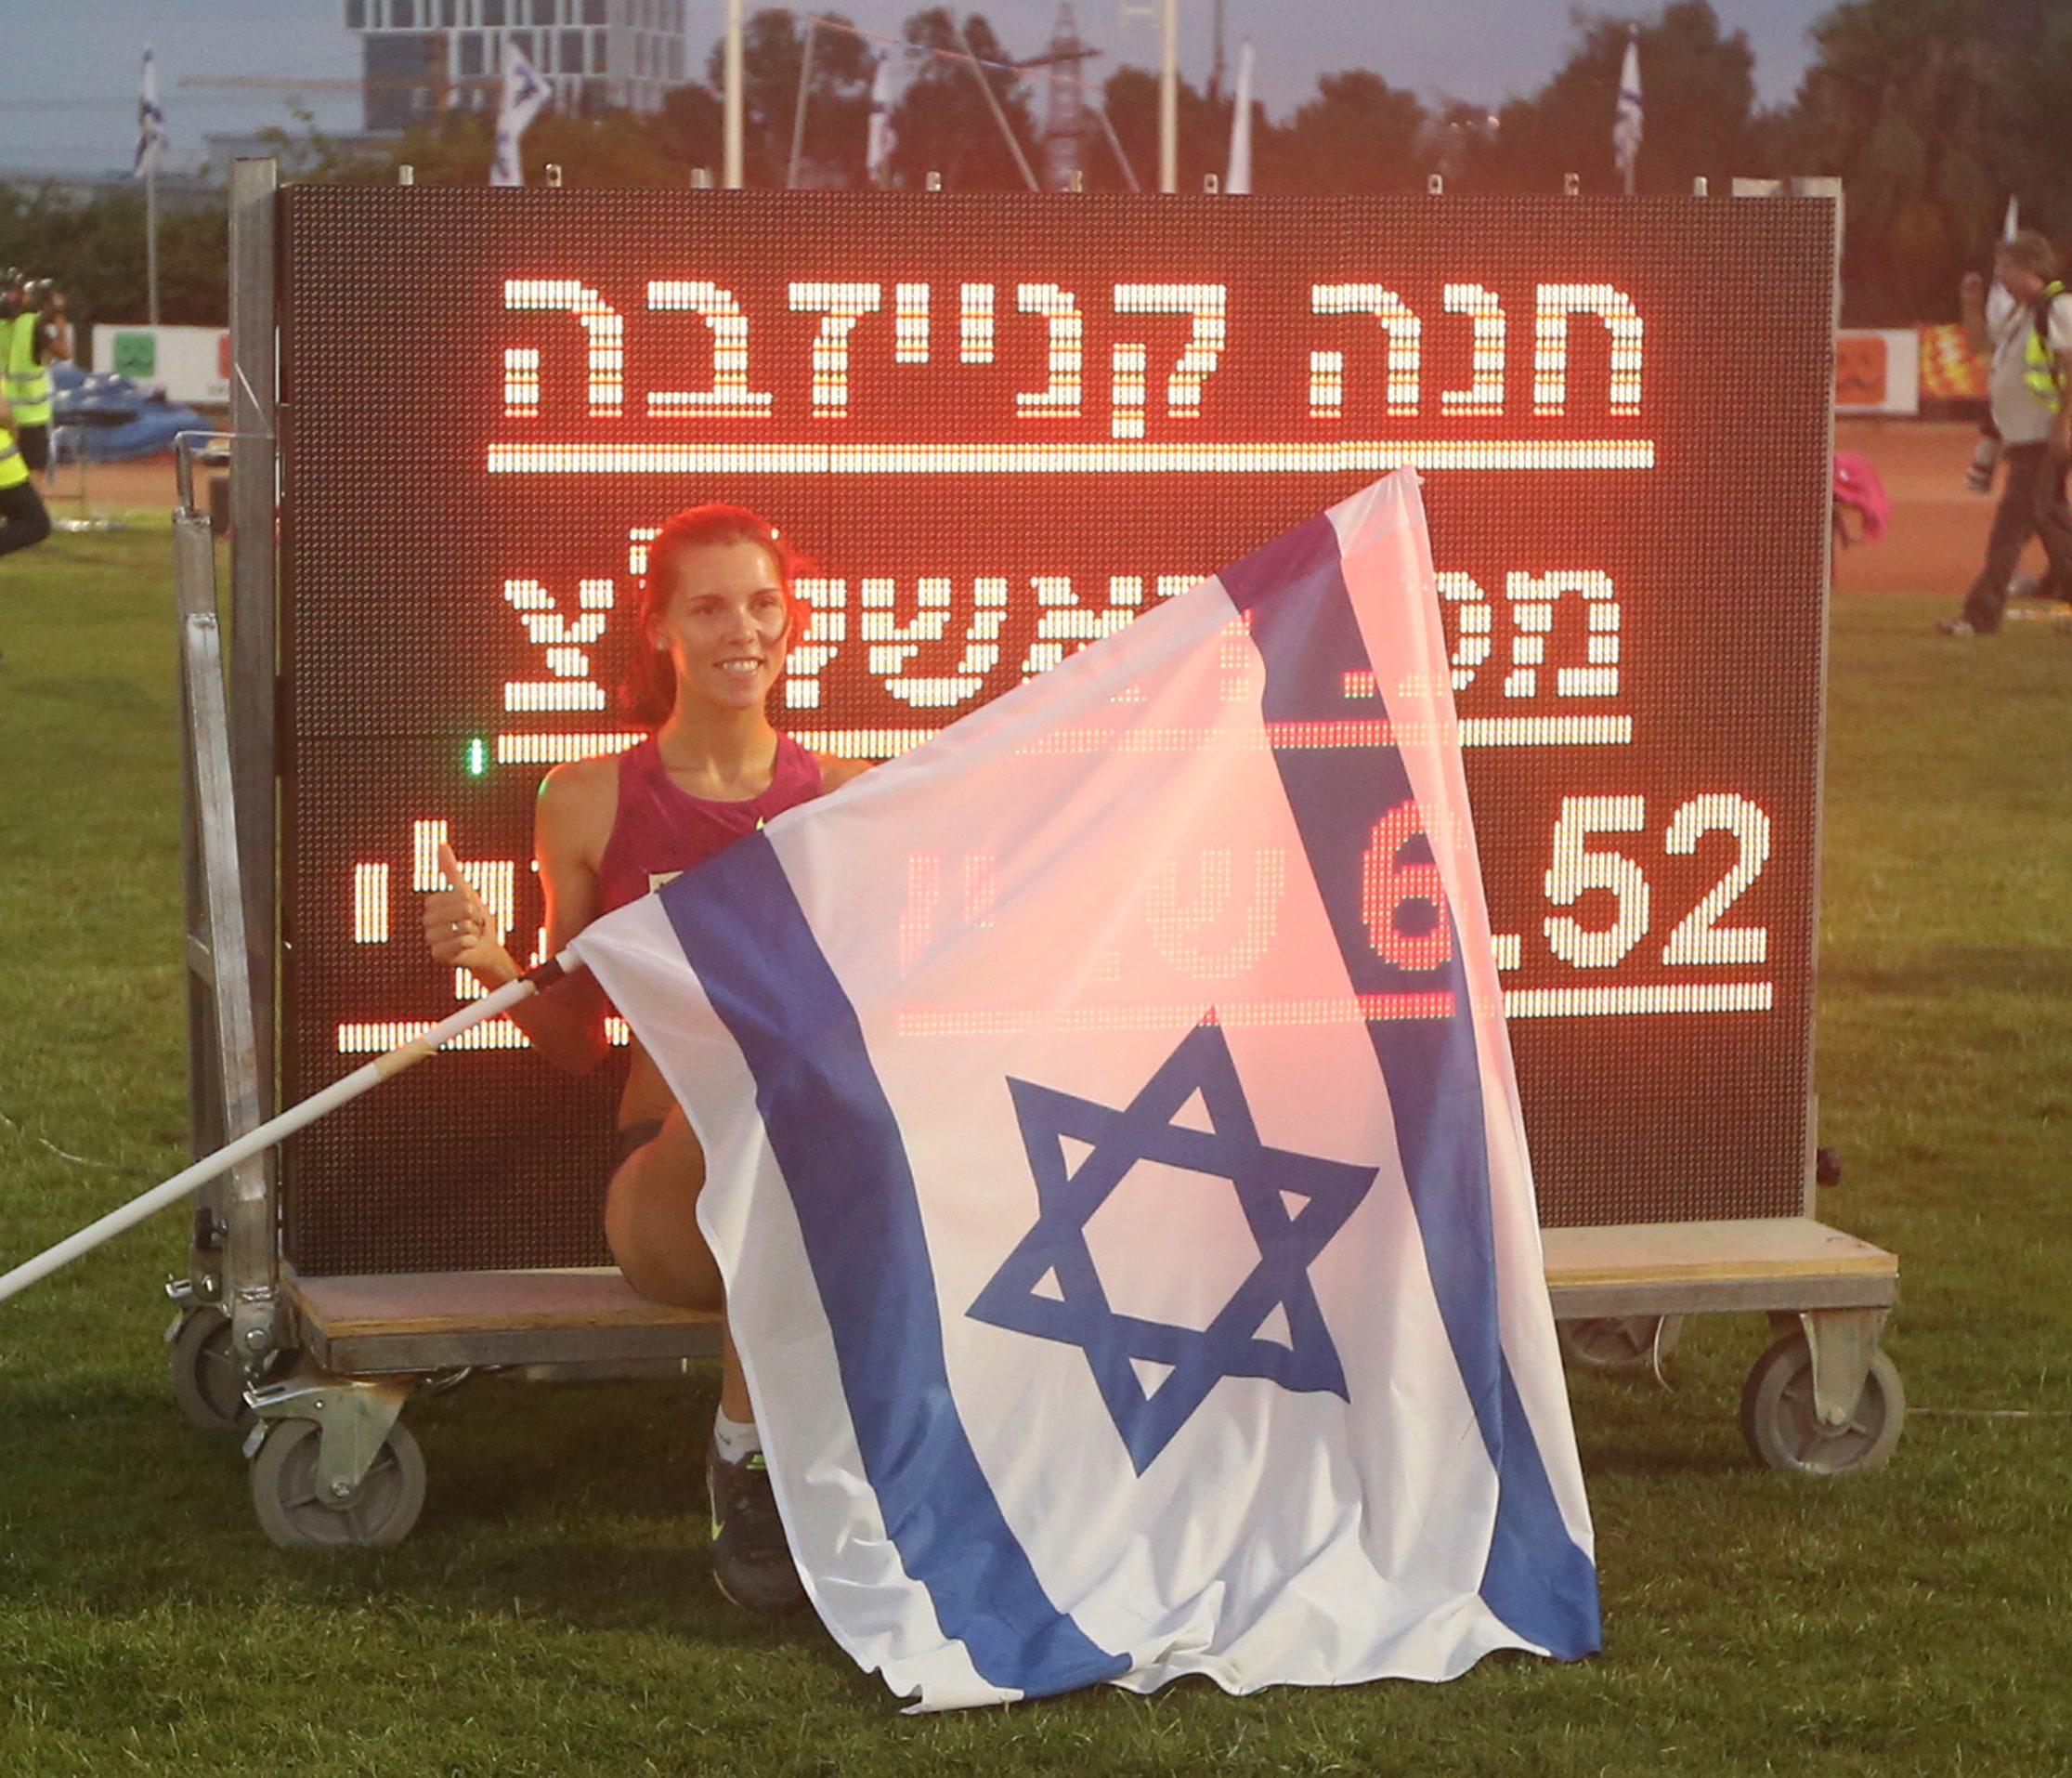 Breaking a record (Photo: Oren Aharoni)